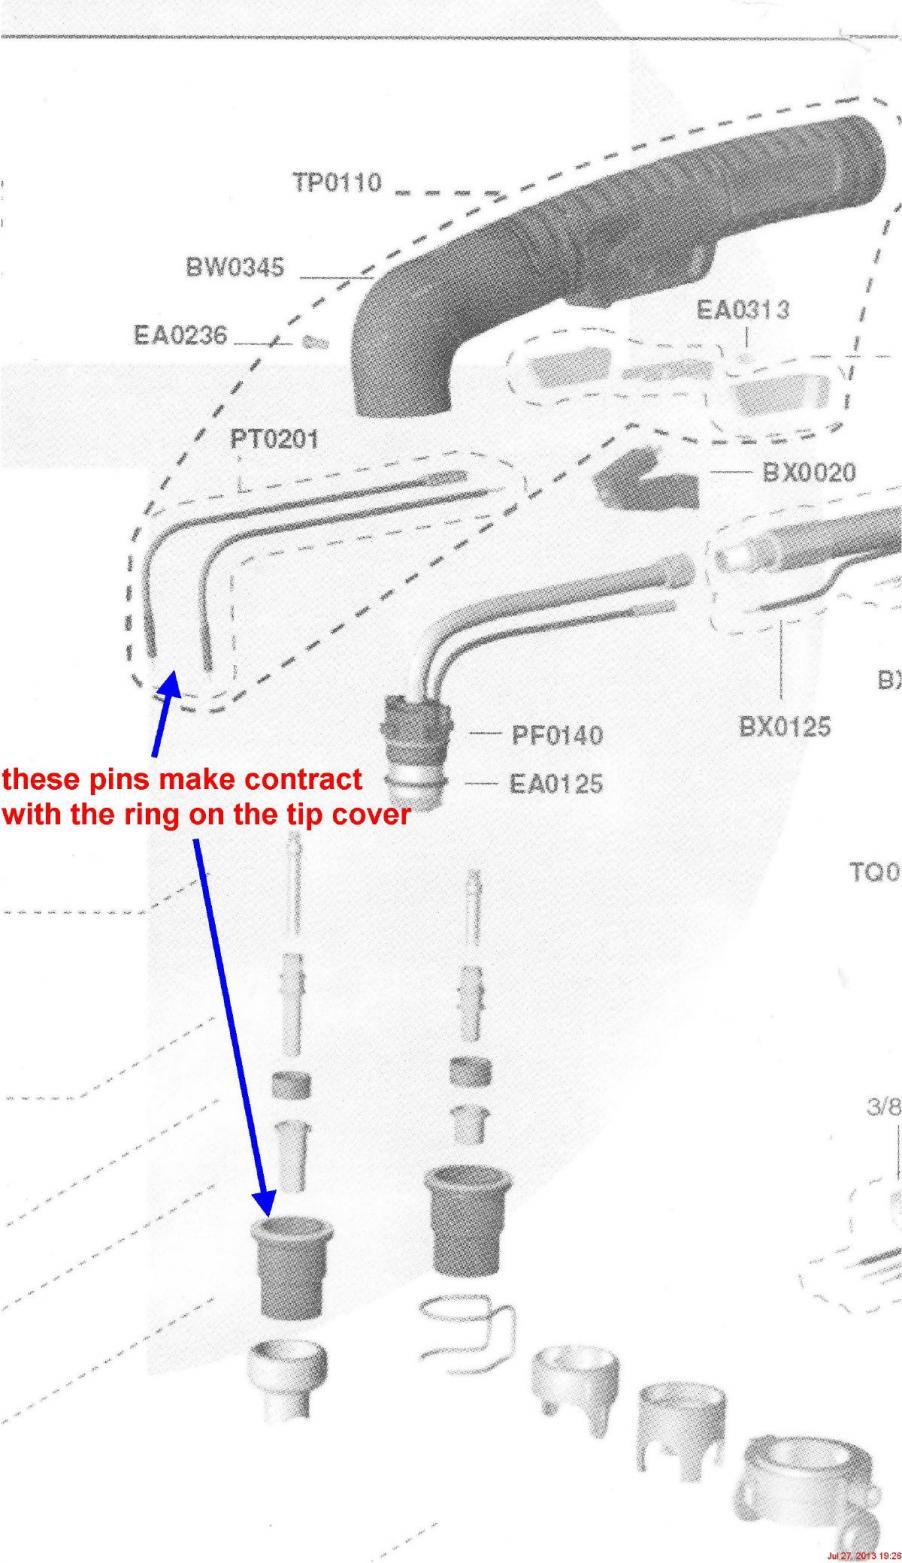 Torchmate Cut System Wiring Diagram Drawing Sketch Liry On Cnc Plasma Cutting Problems